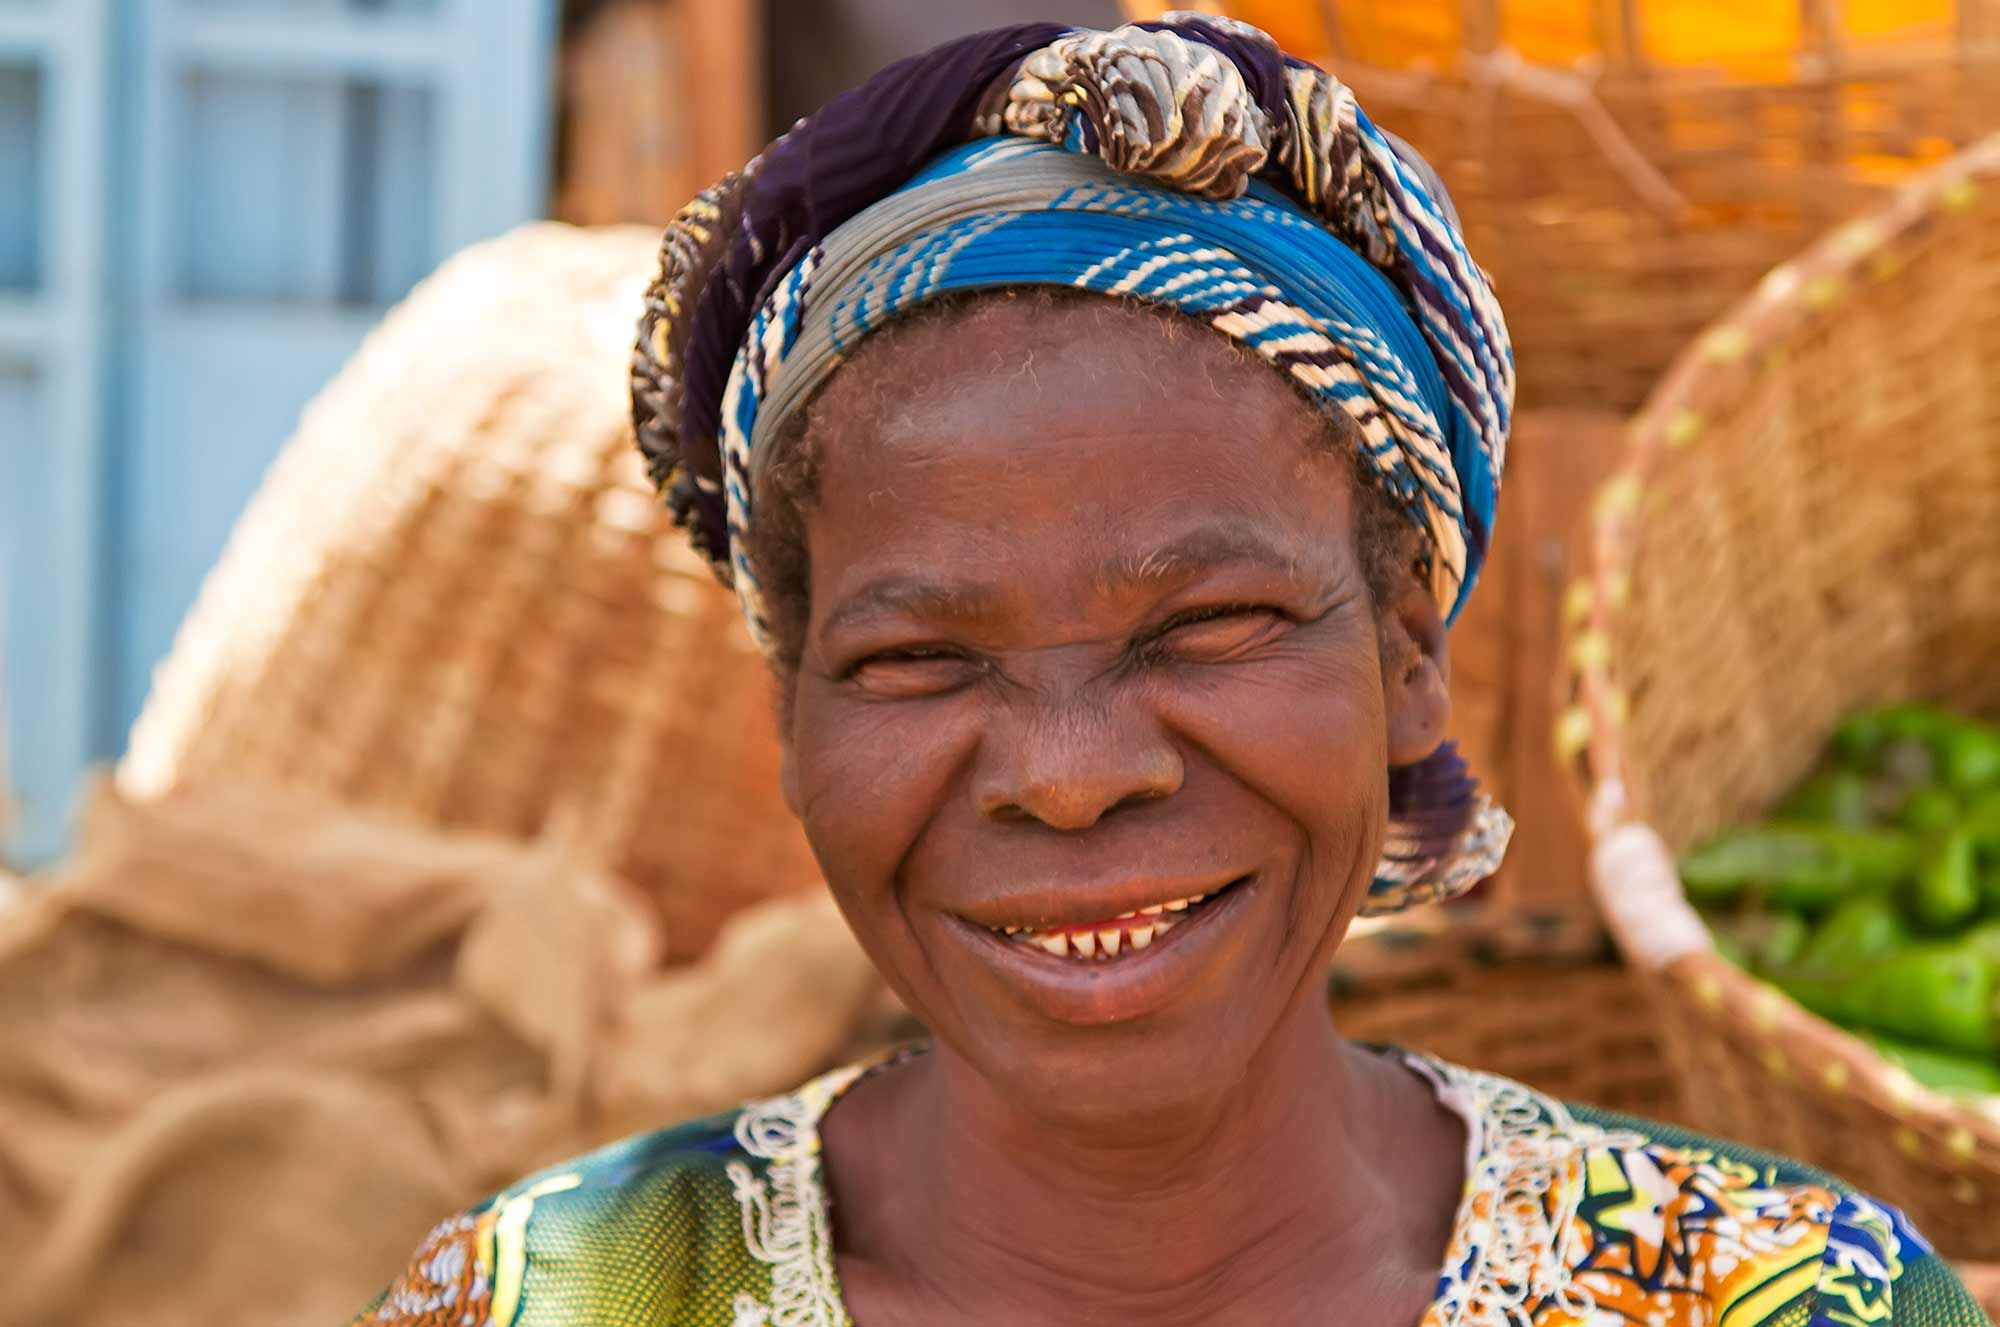 portrait-market-woman-burkina-faso-ouagadougou-africa